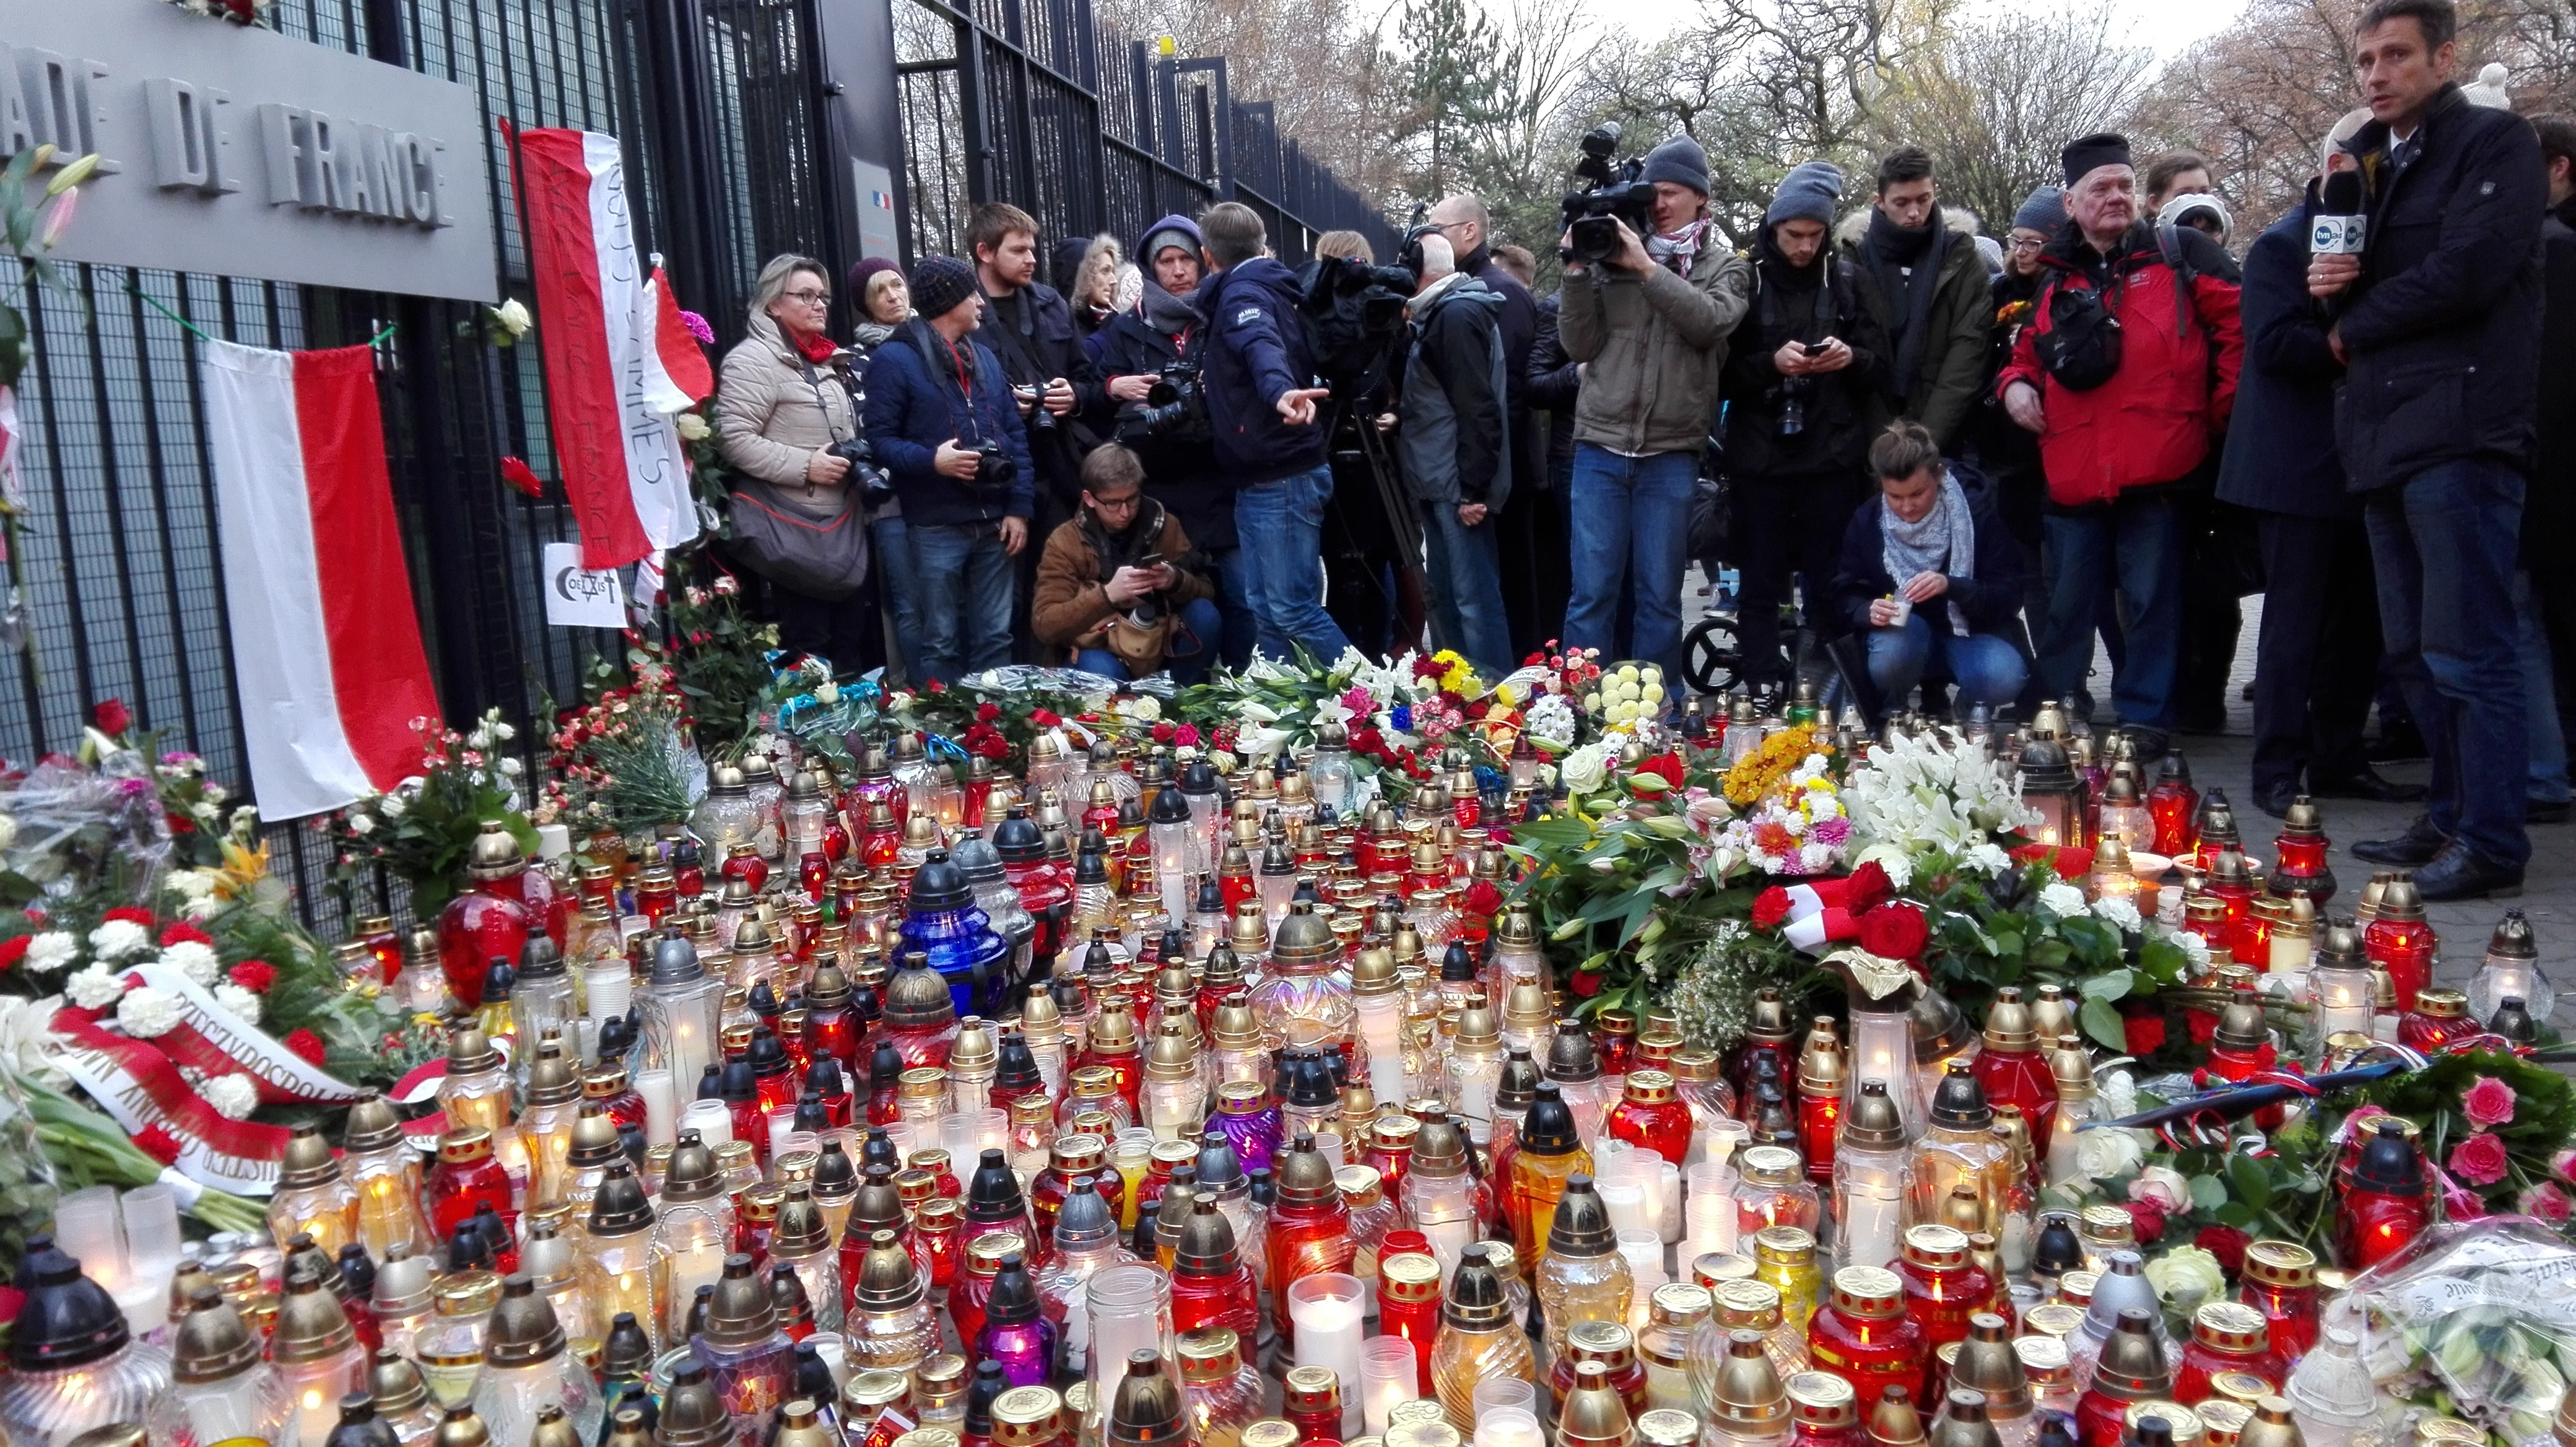 File:November 2015 Paris attacks - French Embassy in Warsaw - 2015 ...